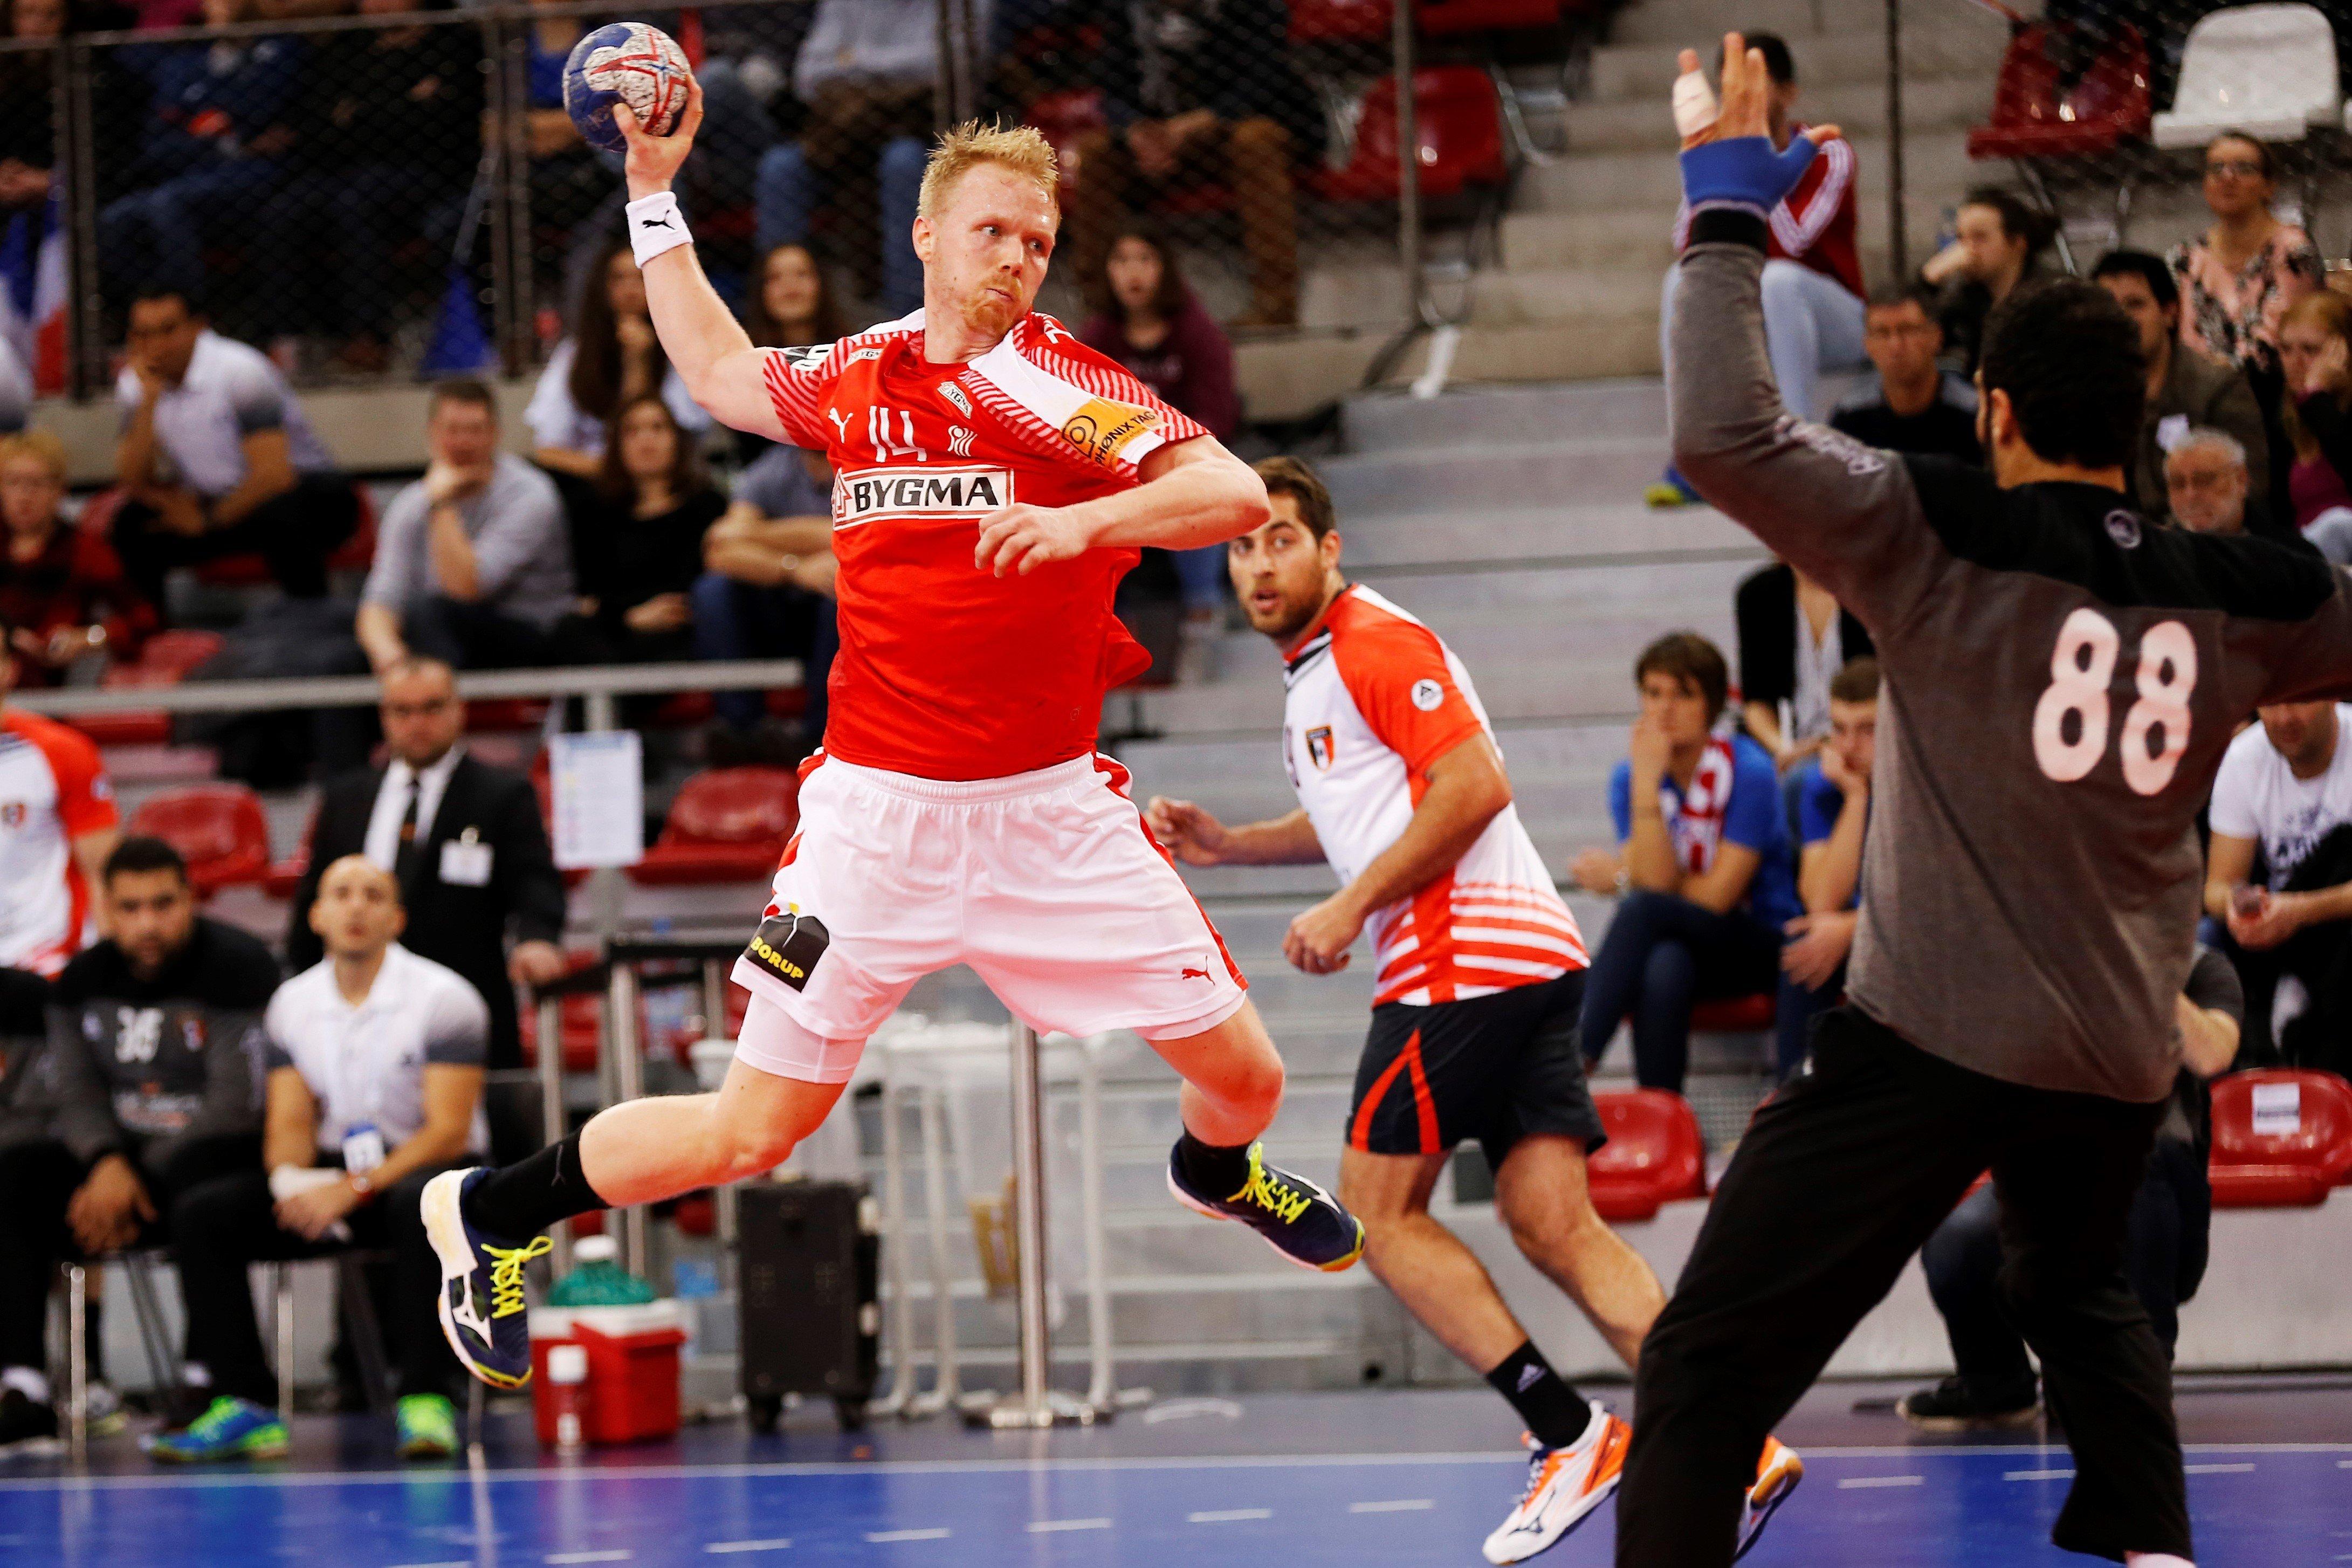 Dänemark greift in die Europameisterschaft an